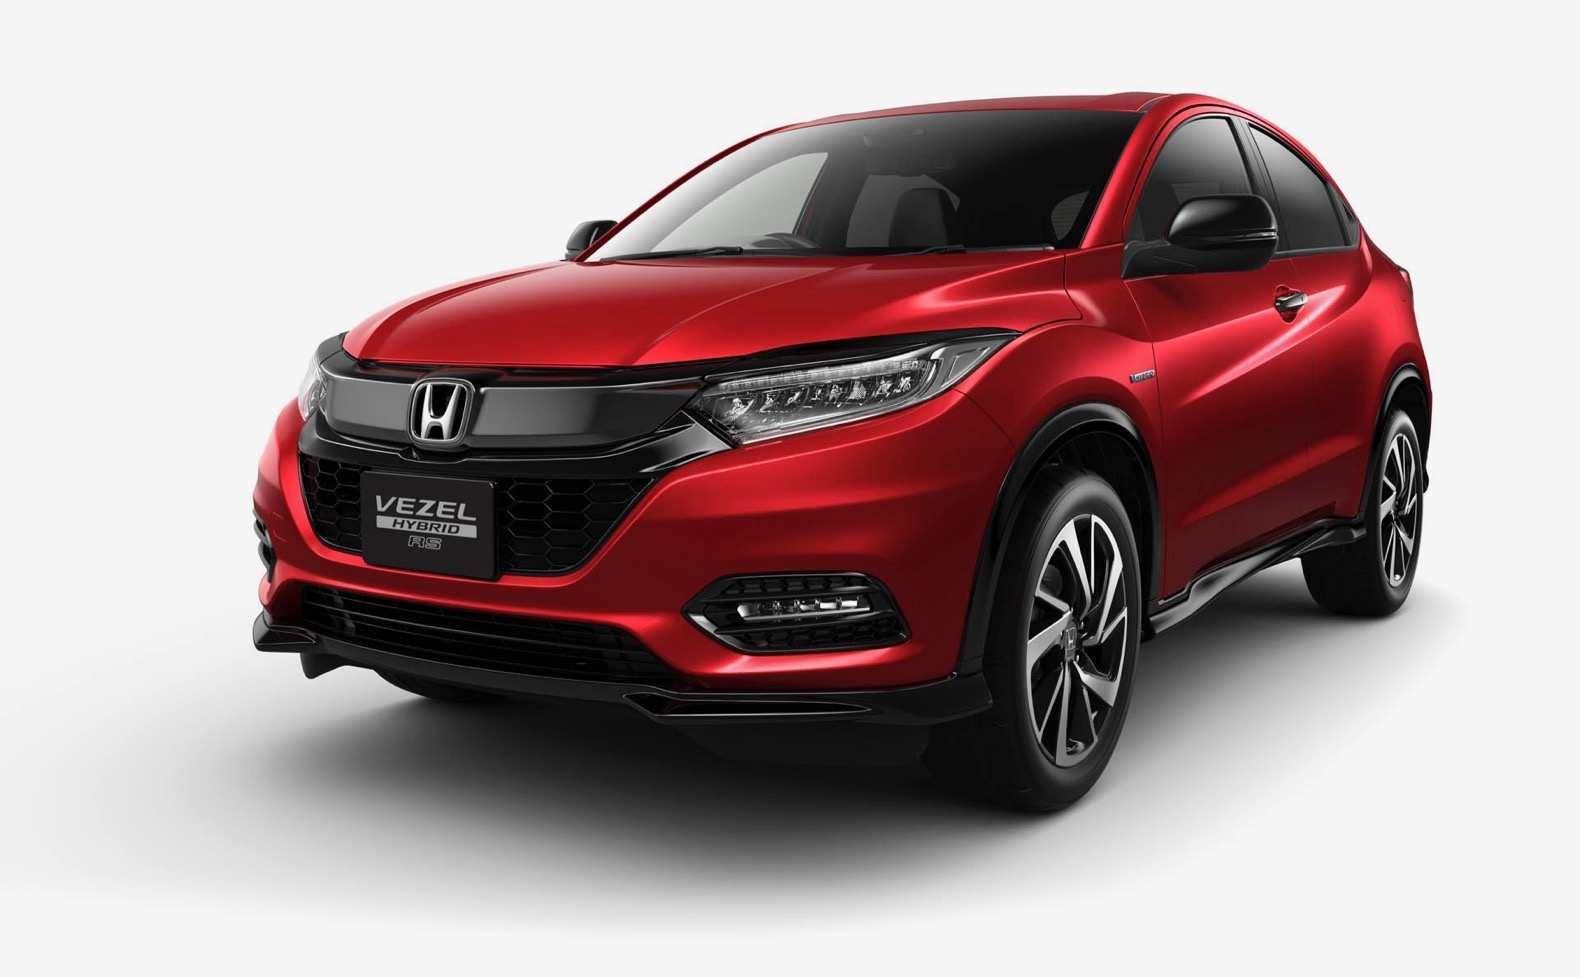 21 All New 2019 Honda Vezel Redesign and Concept for 2019 Honda Vezel